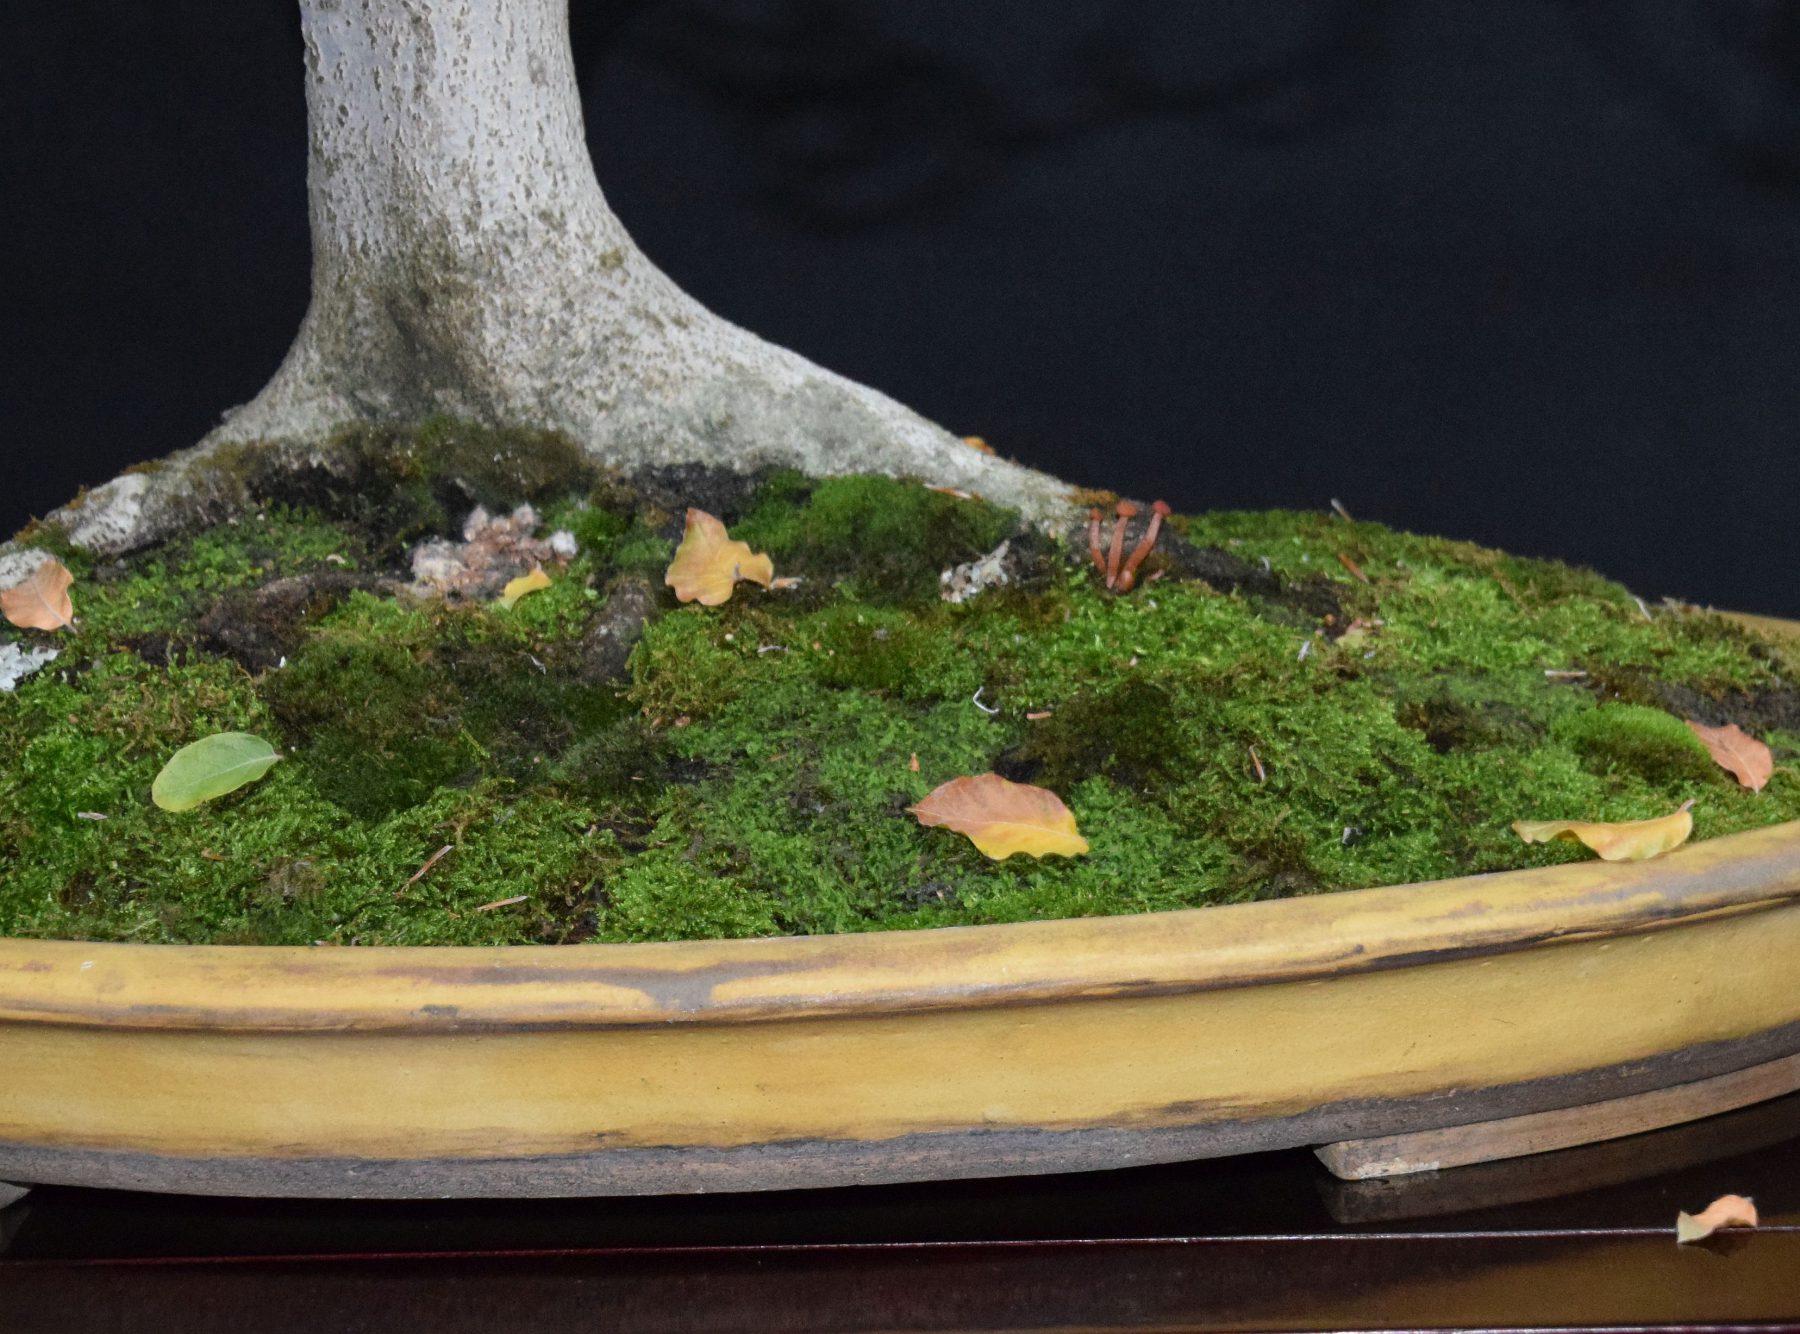 bonsai-museum-luis-vallejo-022